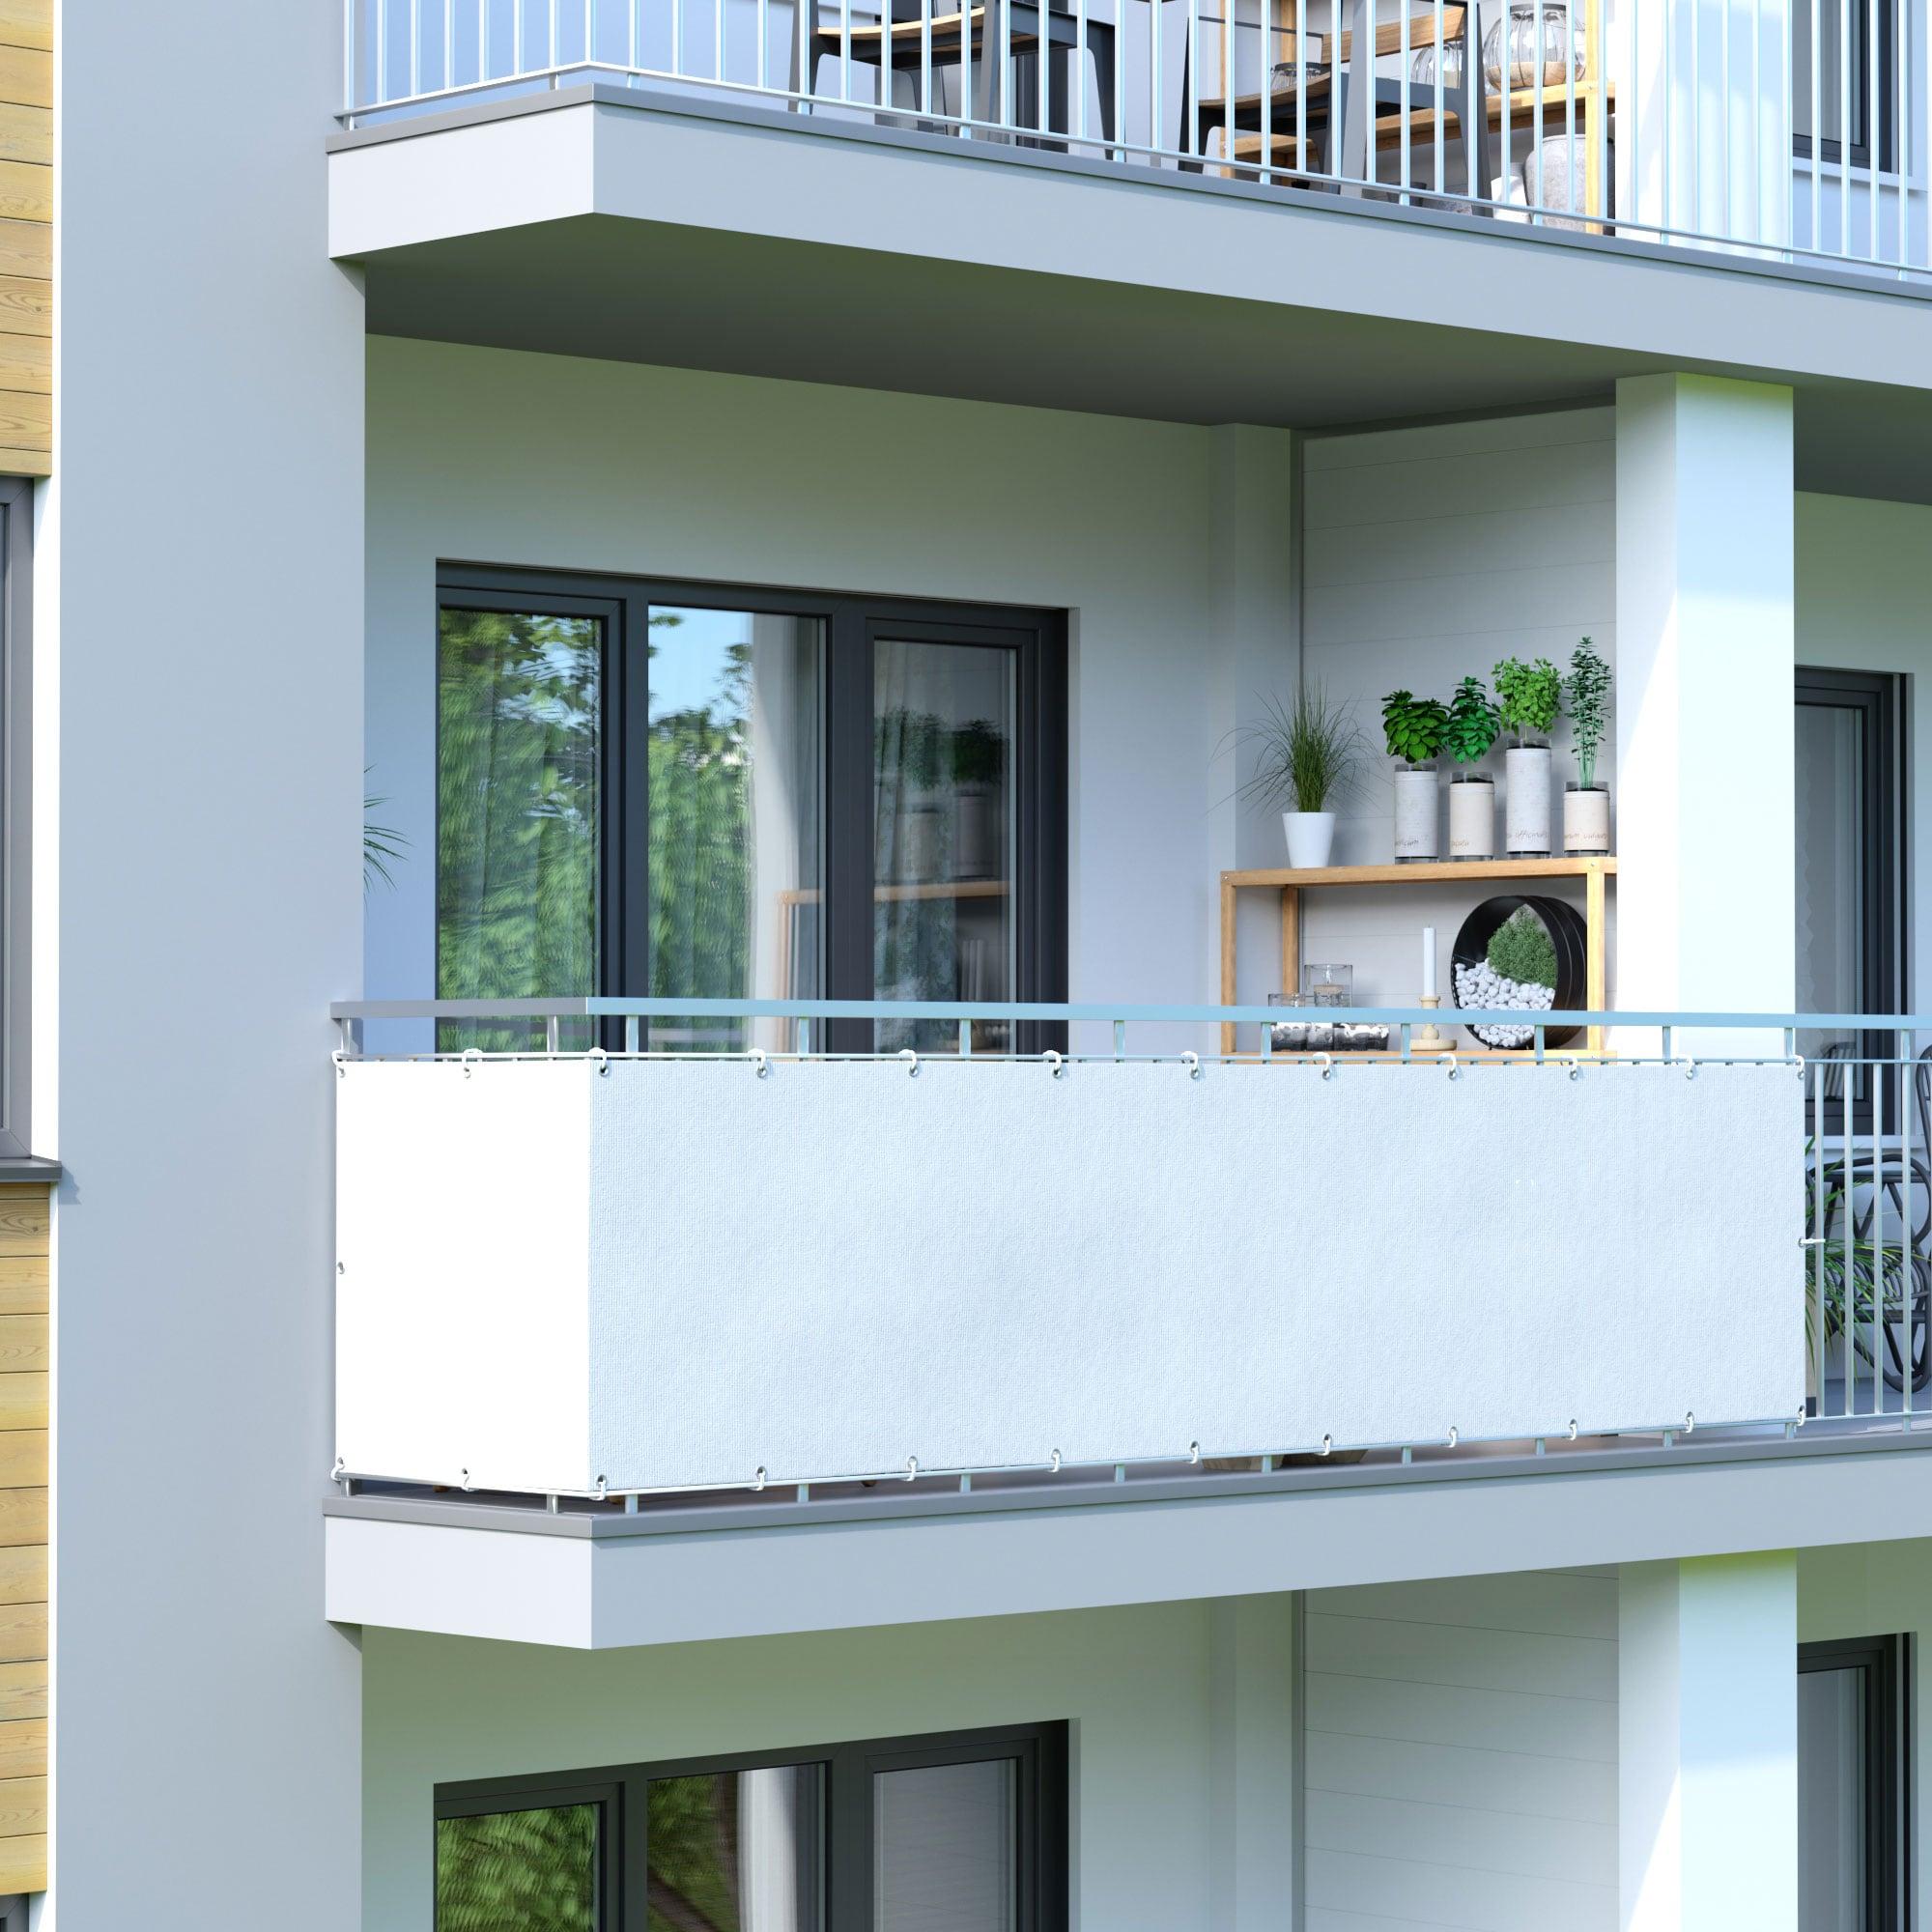 Außenrollos Senkrechtmarkisen für Balkon JAROLIFT